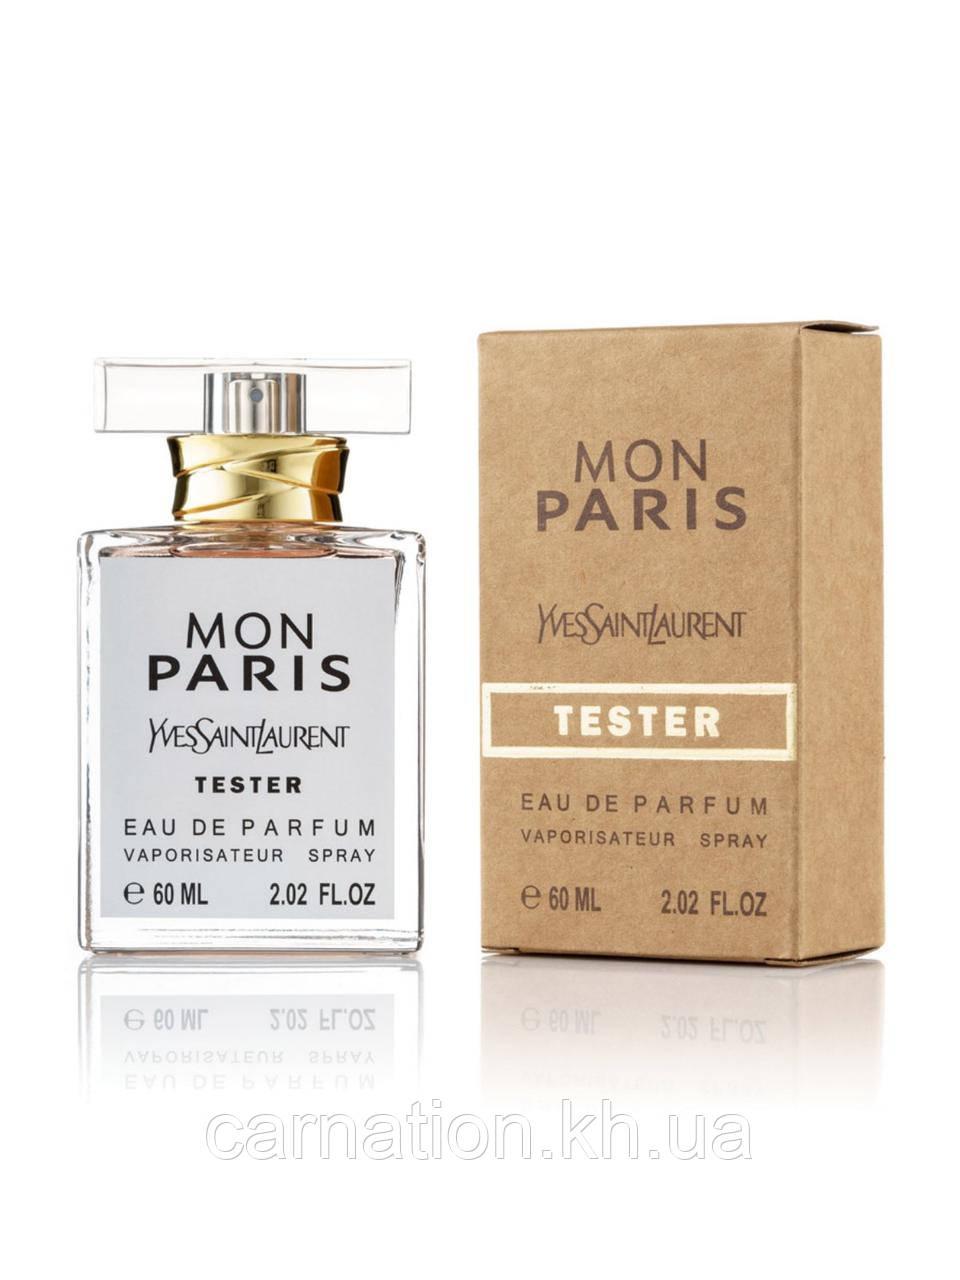 Женский тестер Yves Saint Laurent Mon Paris 60 мл